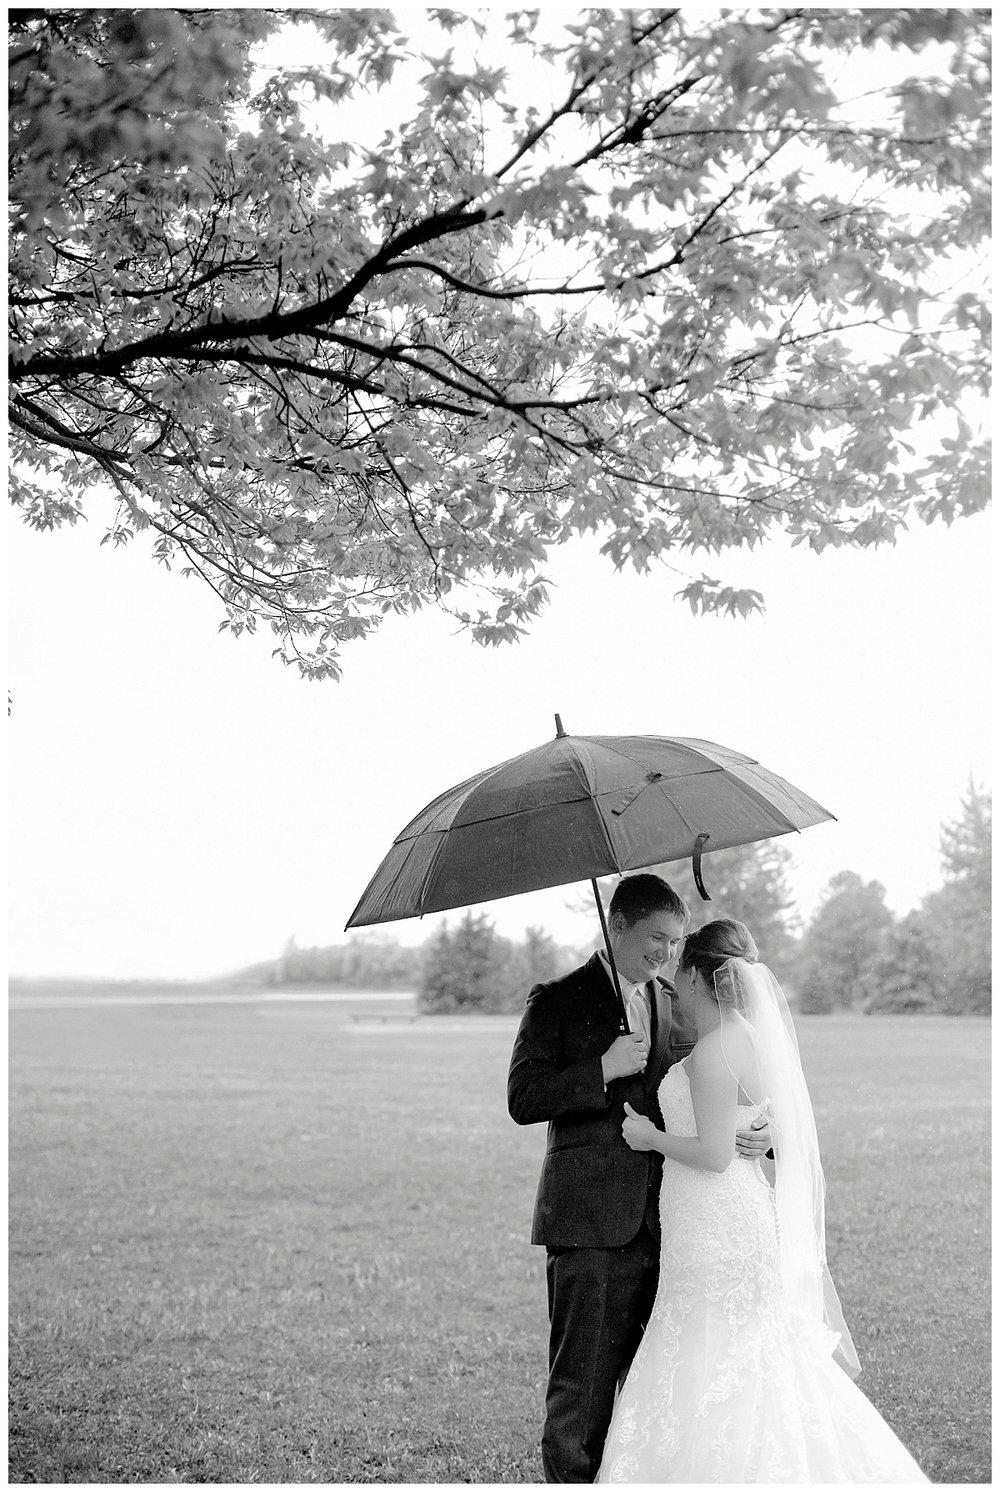 TannerAmy_RainyWedding_BethanyMelvinPhotography_0024.jpg